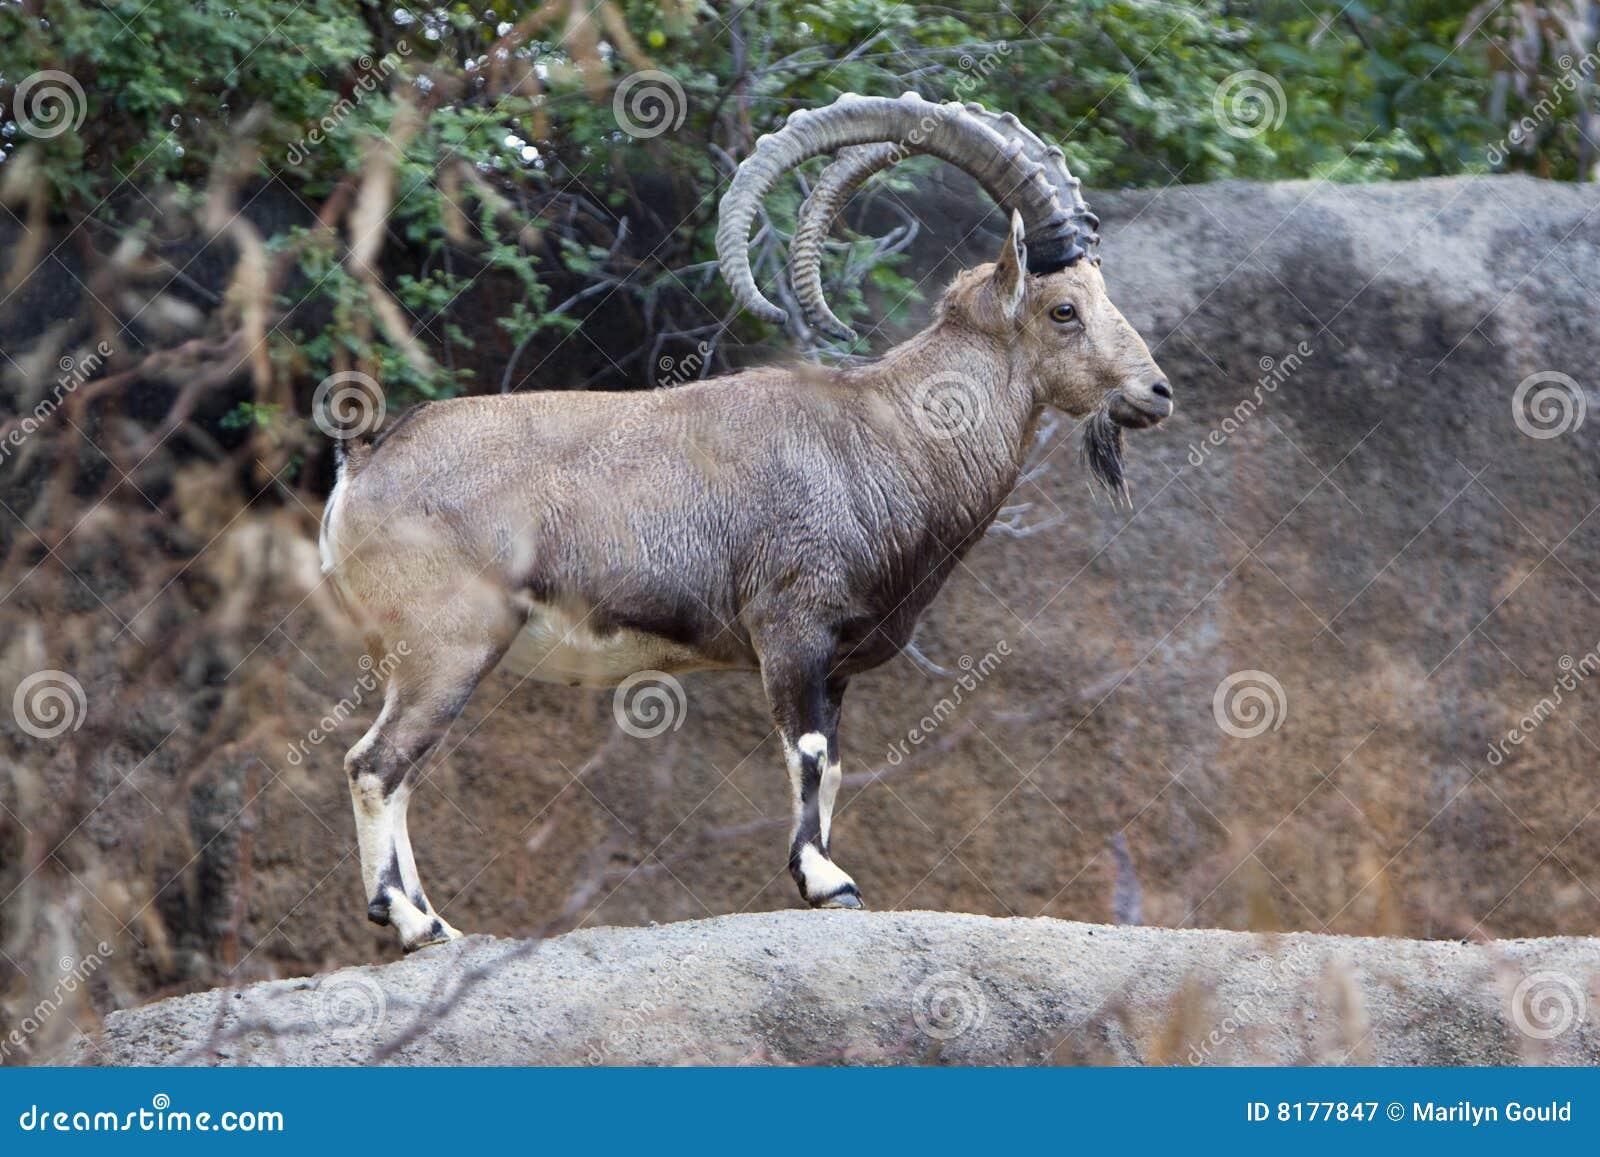 Ibex Goat Nubian Ibex Royalty Free Stock